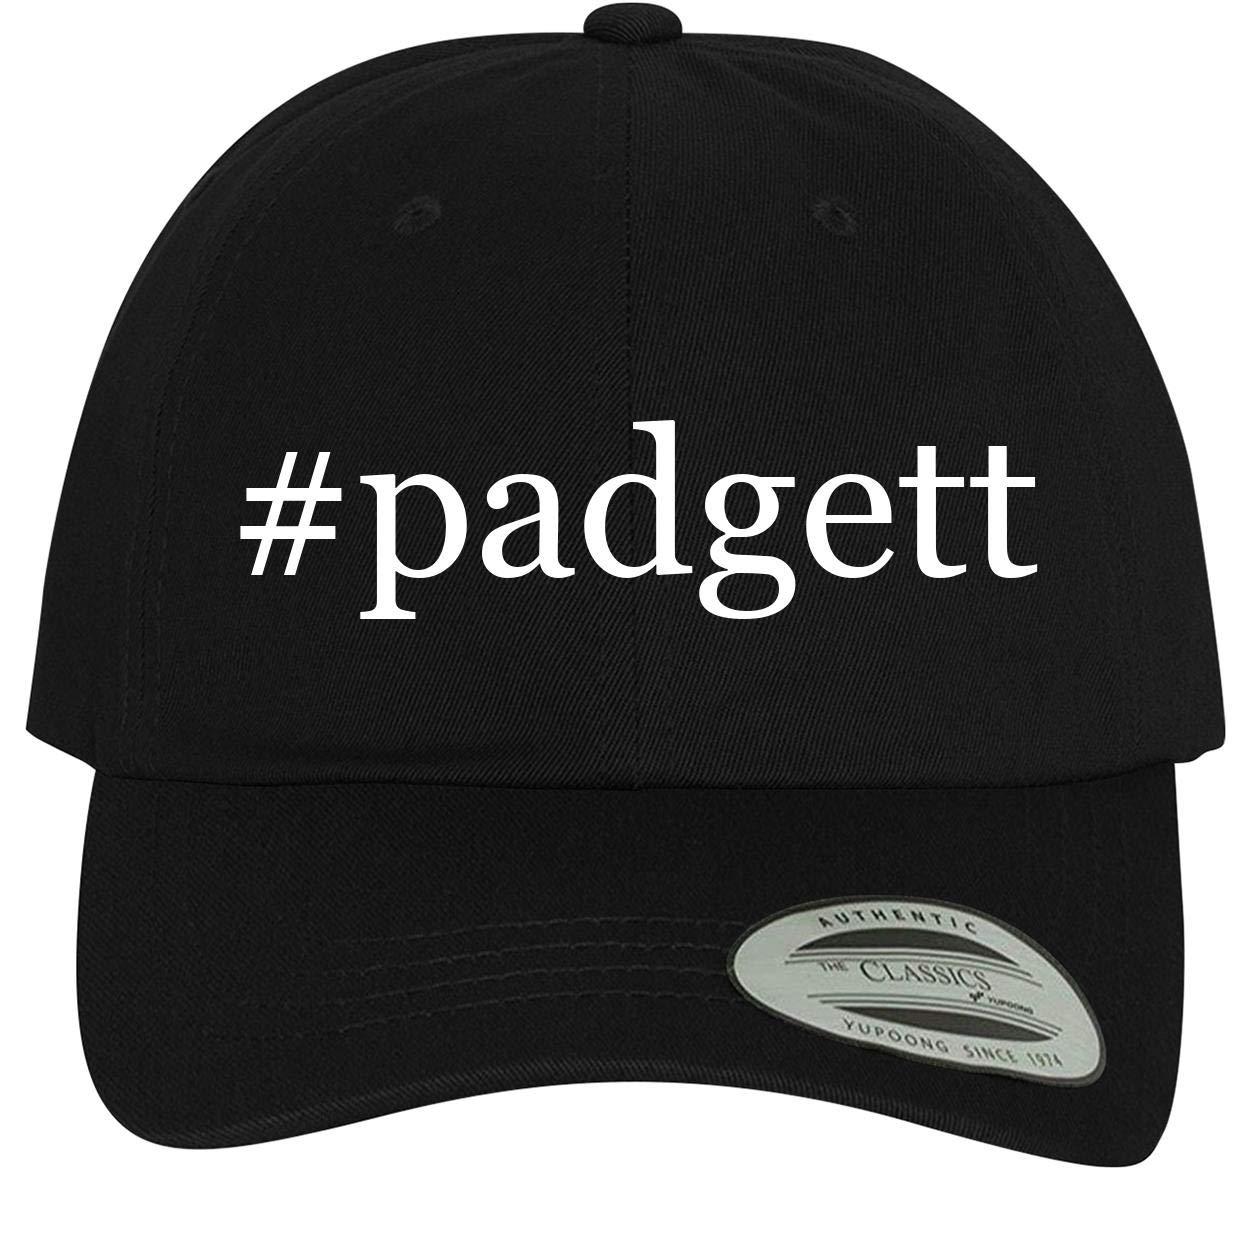 BH Cool Designs #Padgett Comfortable Dad Hat Baseball Cap